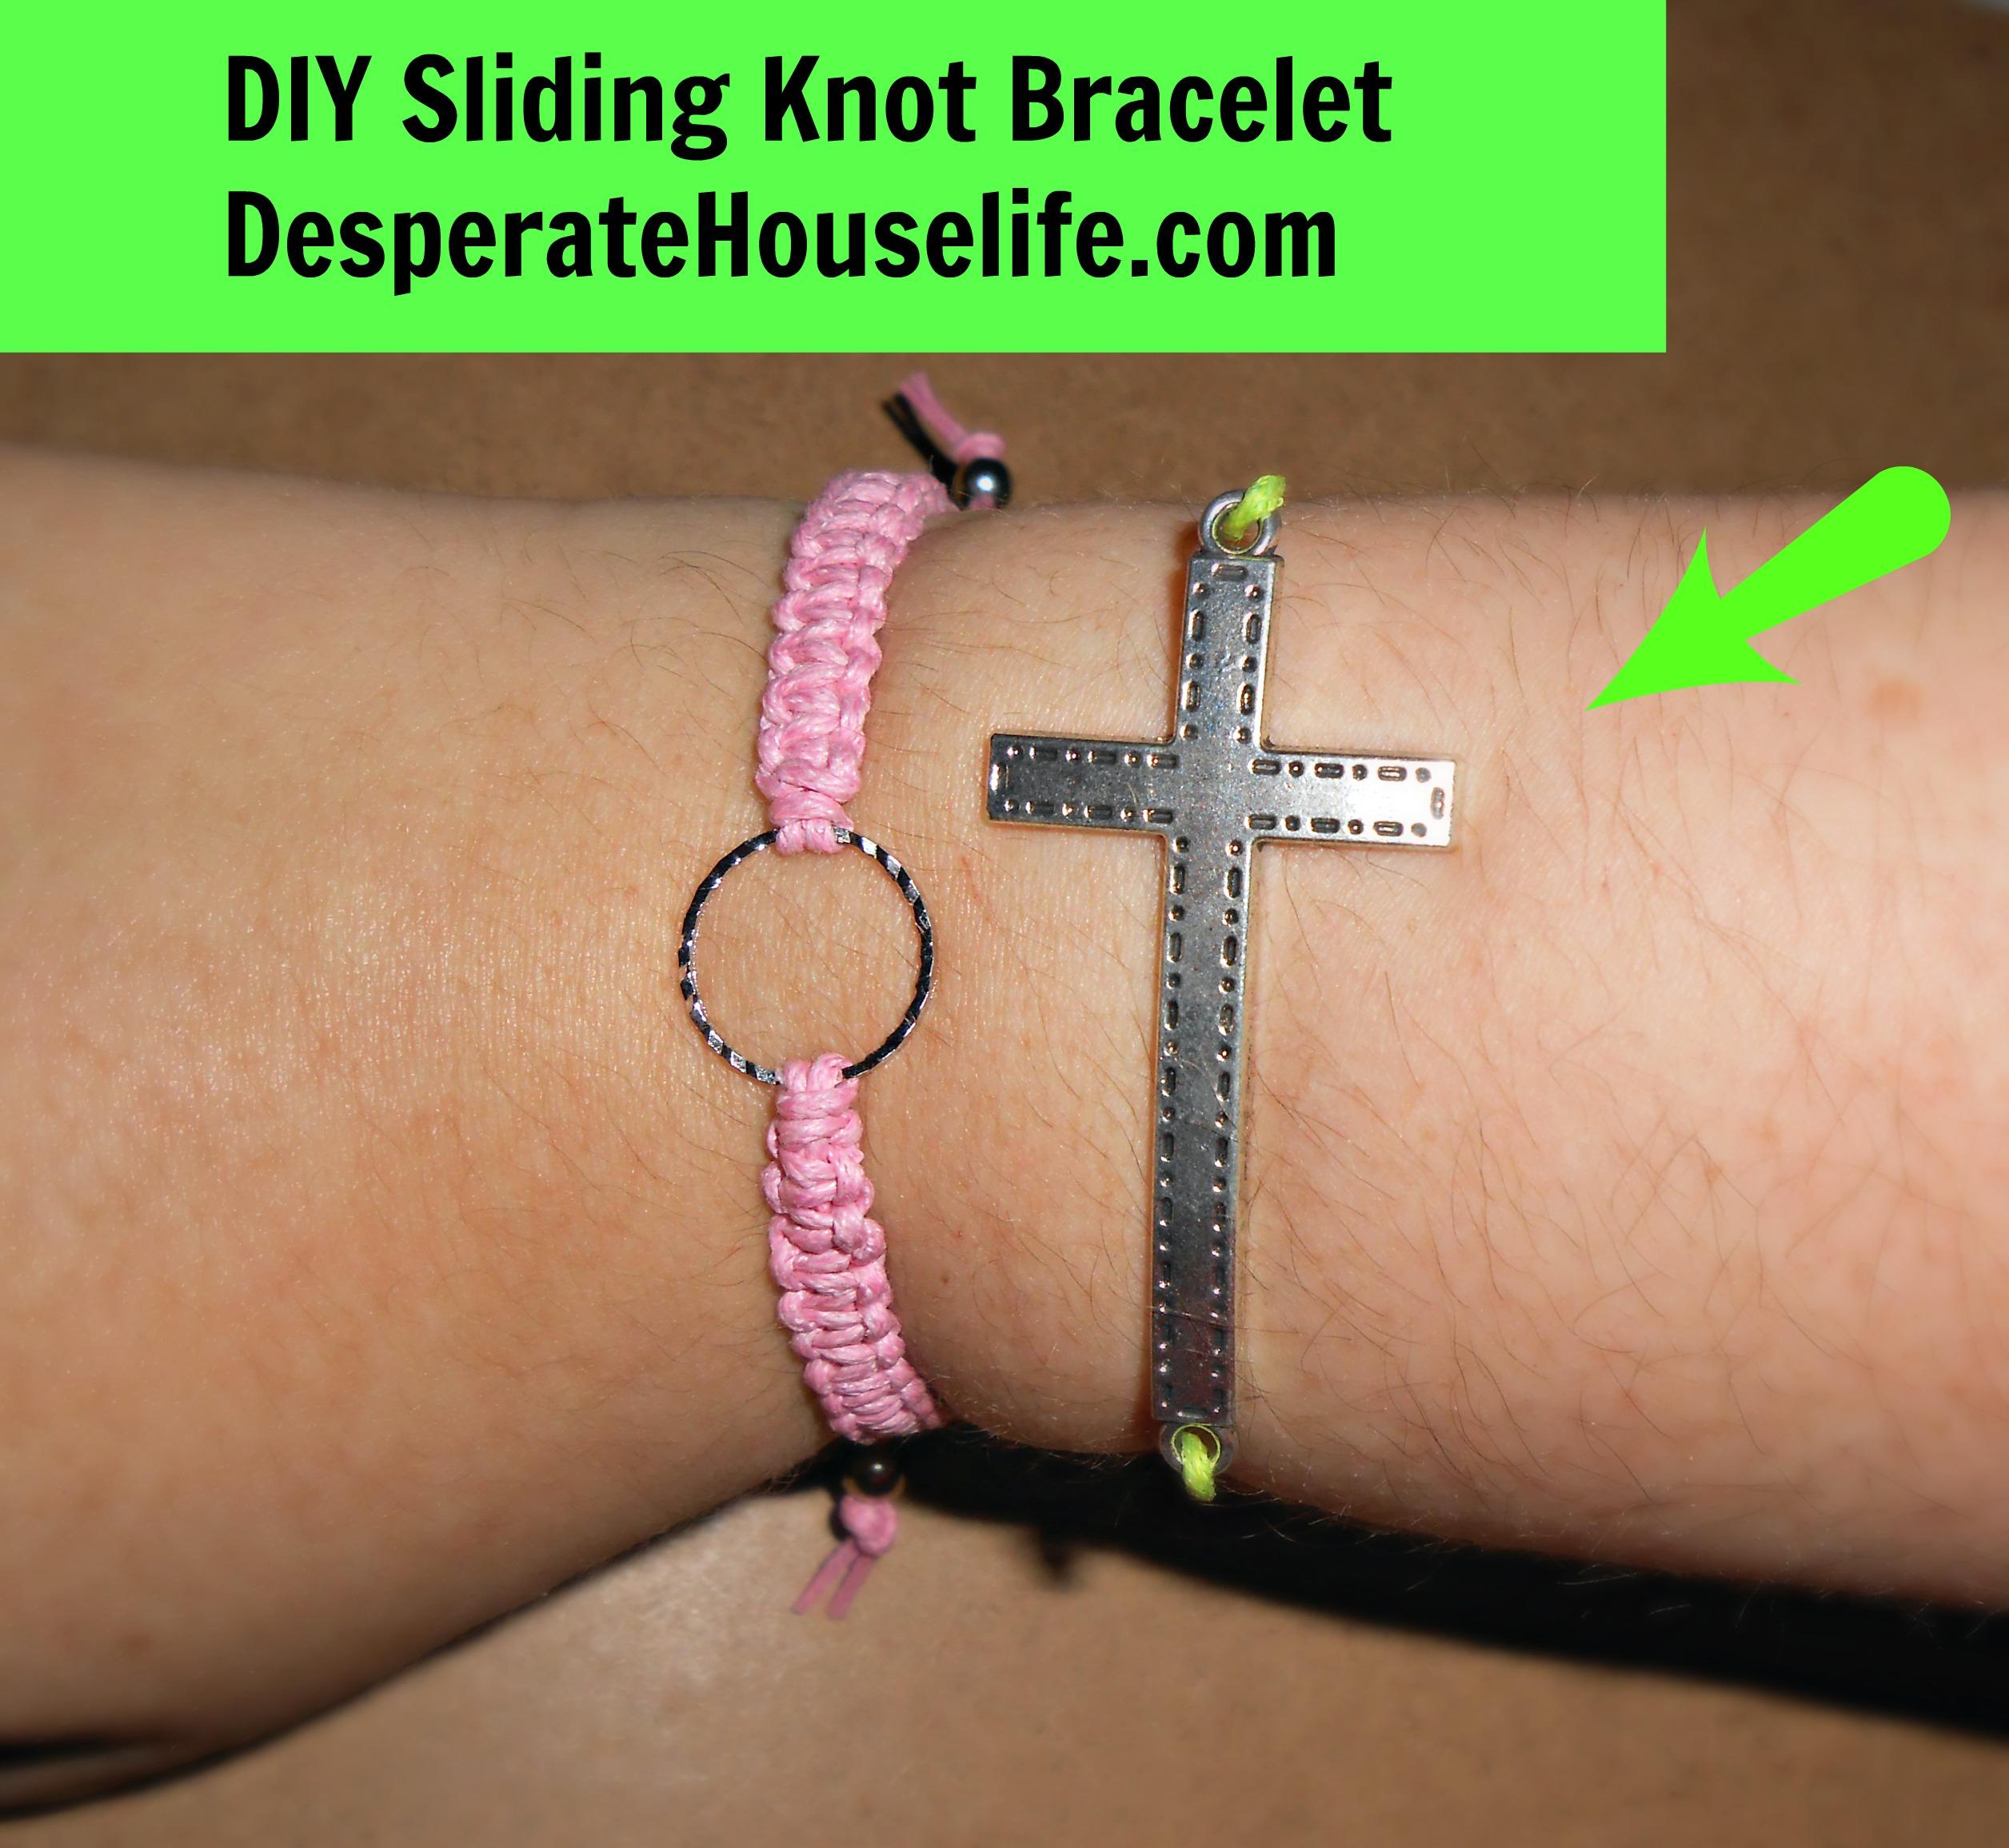 Sliding knot bracelet diy cross sliding knot bracelet diy baditri Image collections